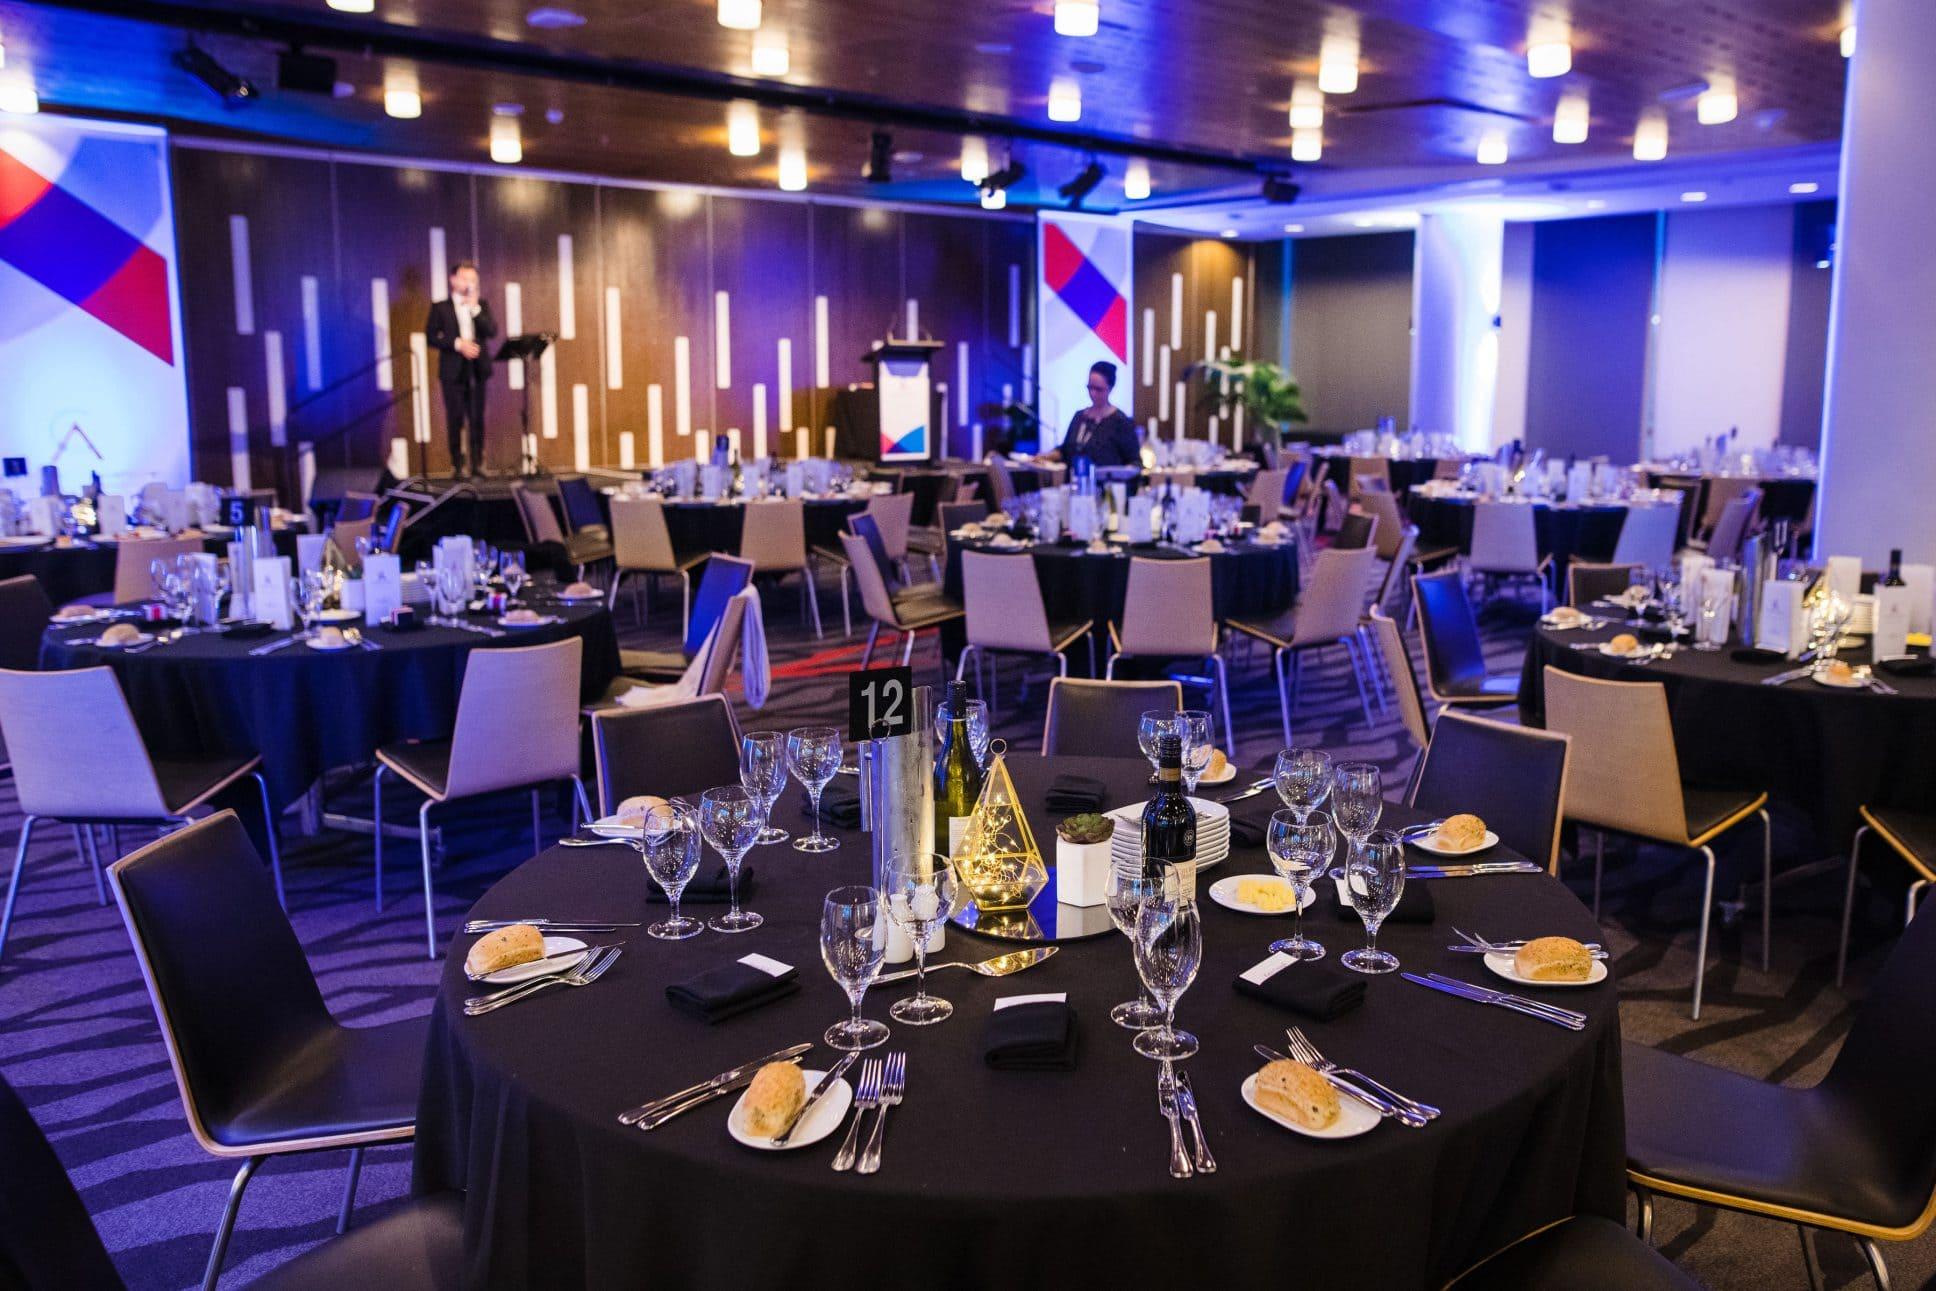 Eden Park gala dinner in Auckland.